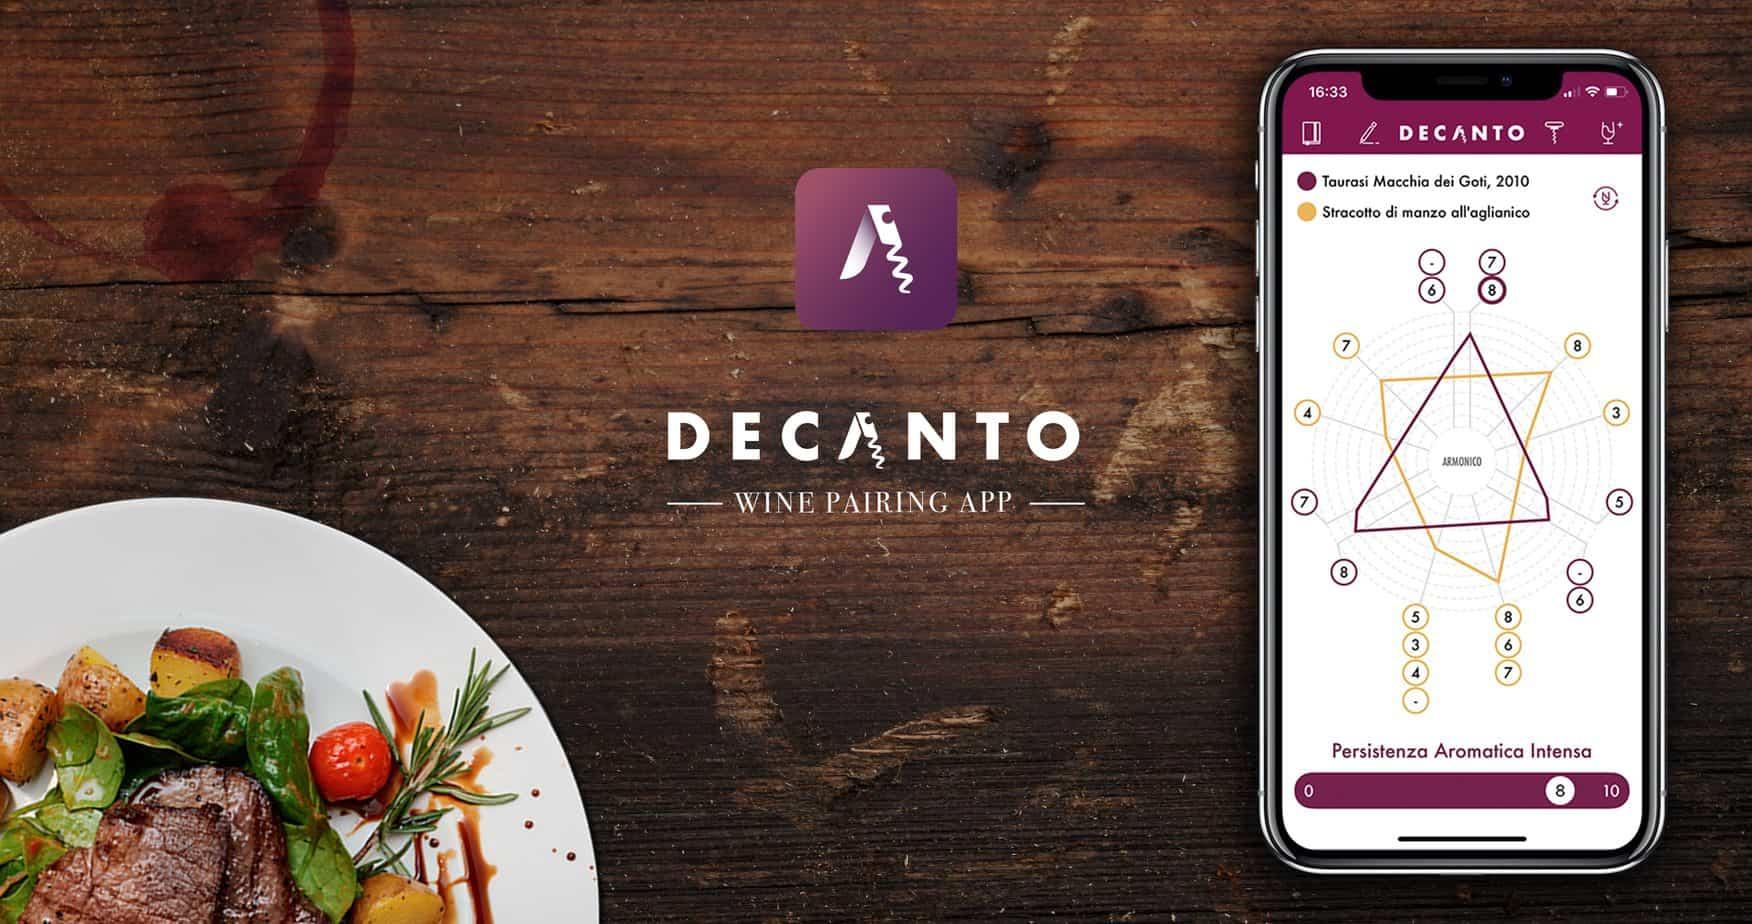 Decanto Wine Pairing App Cover Image